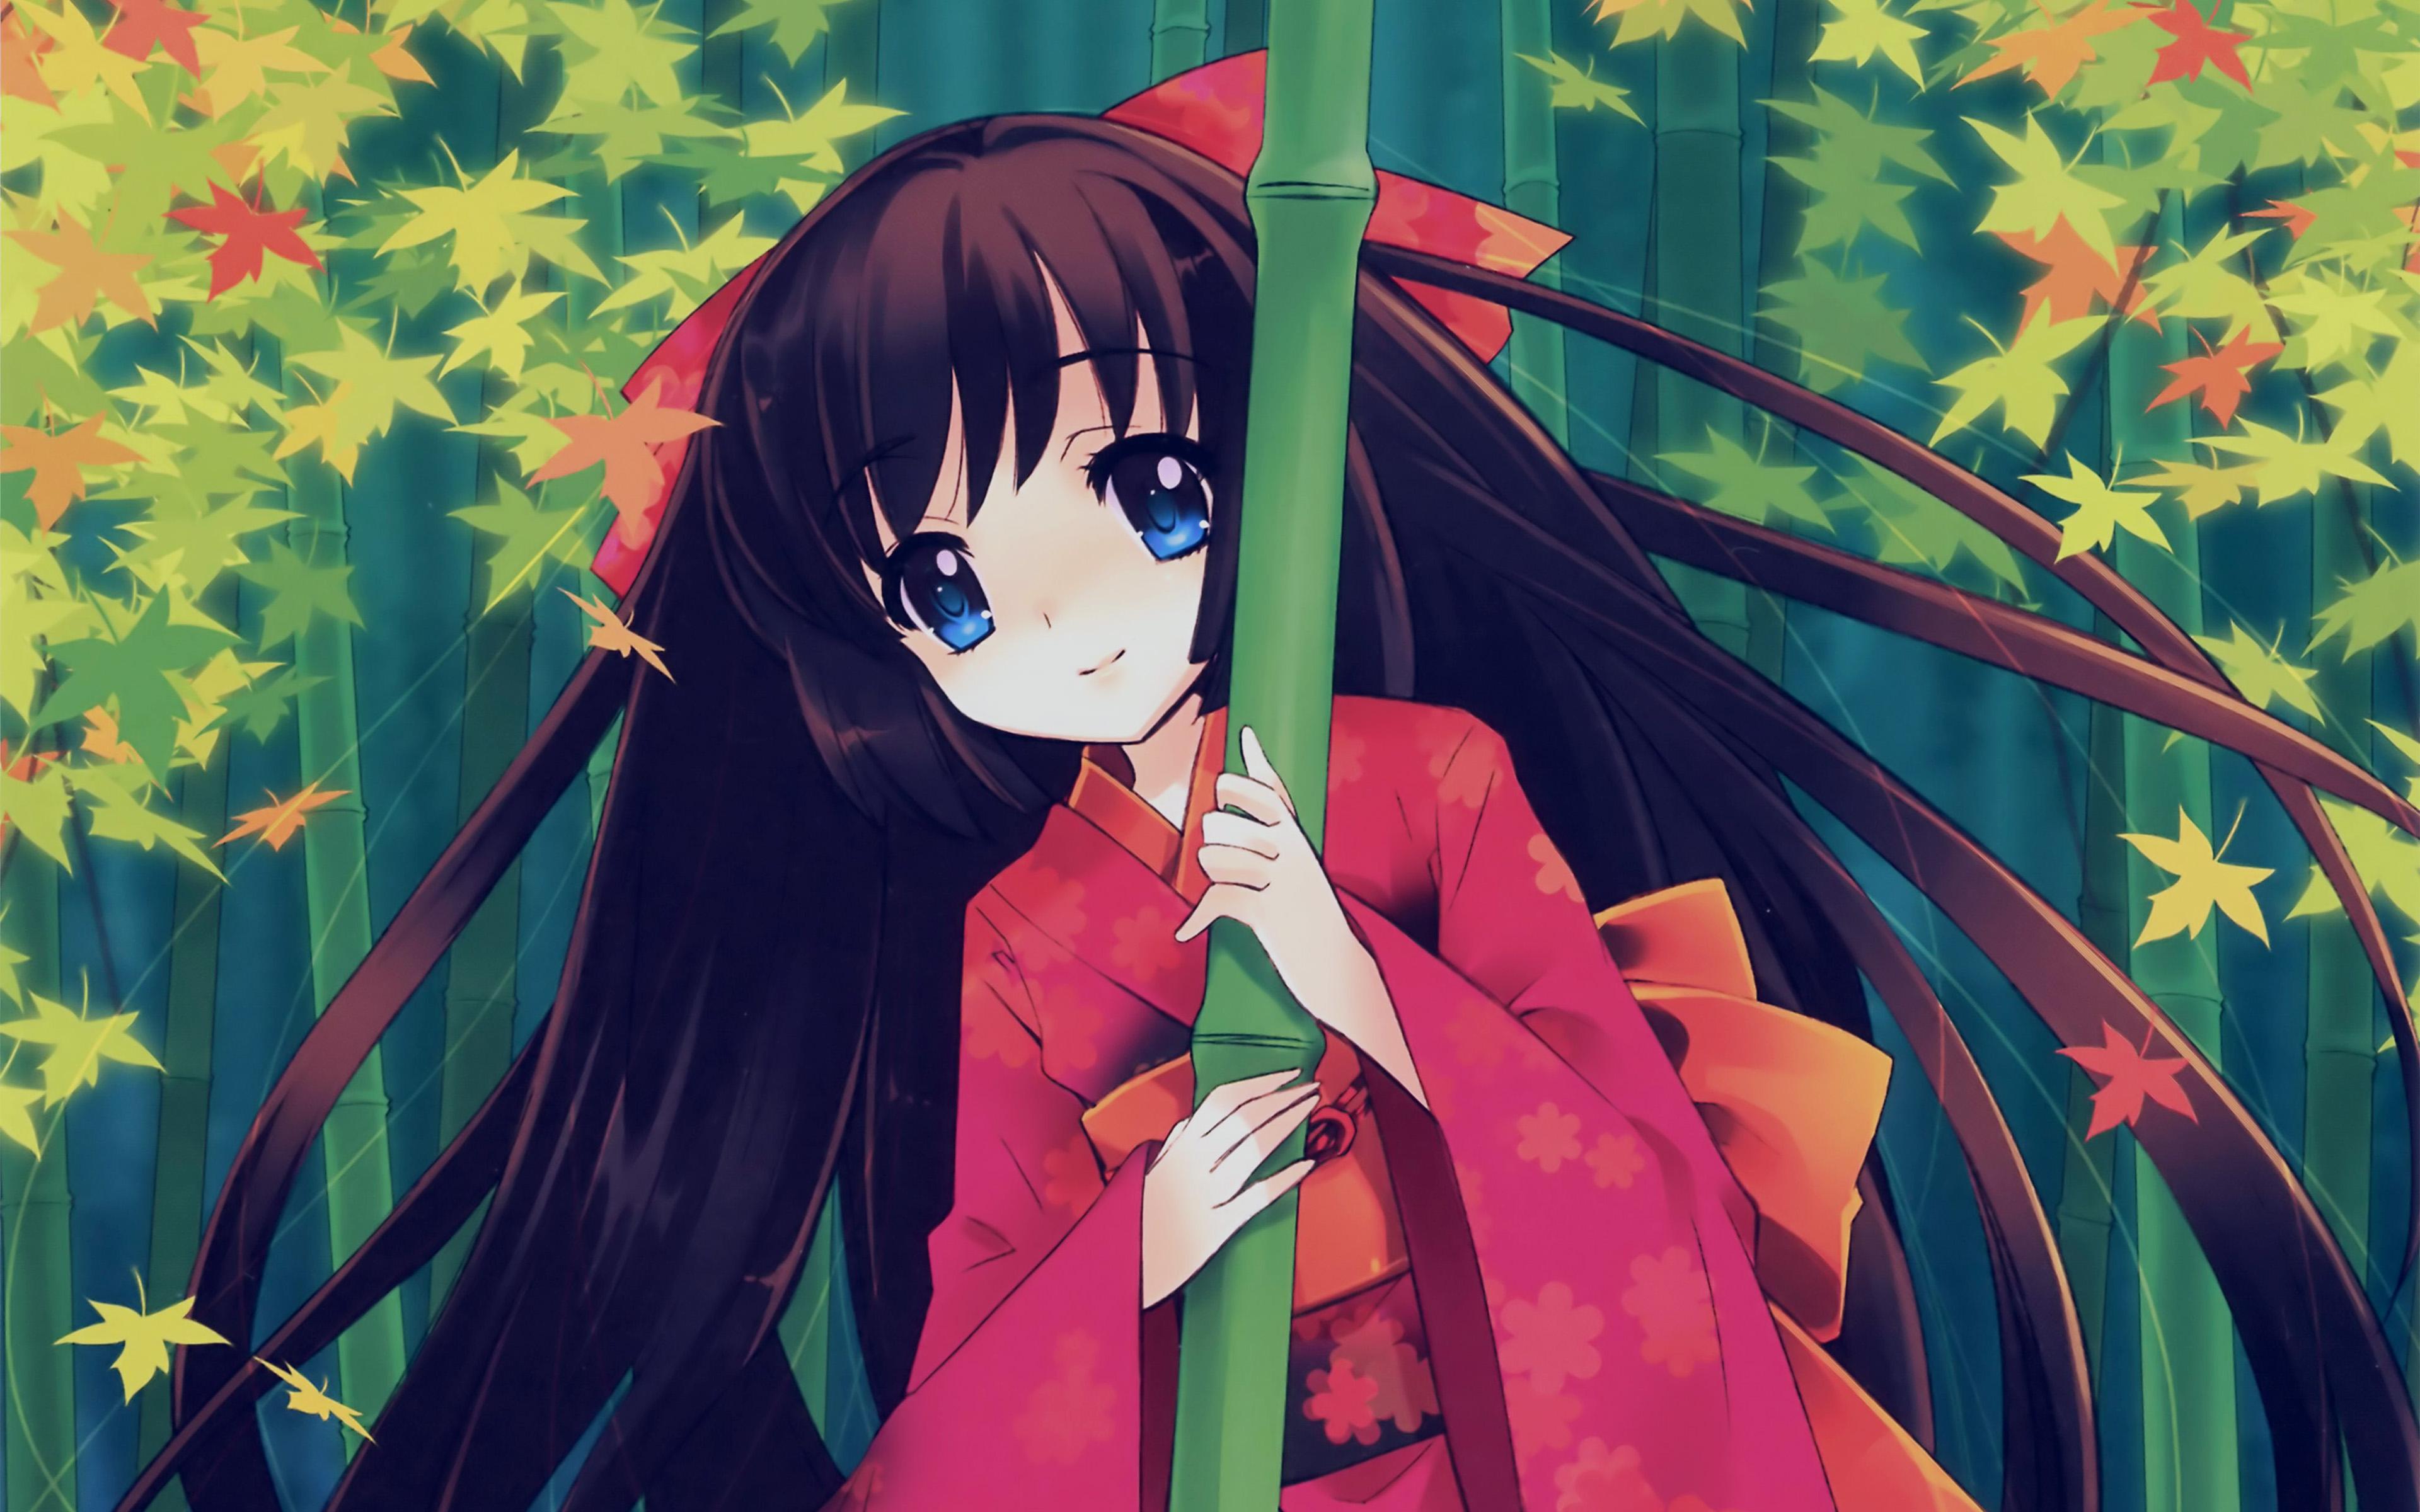 Aq47 Anime Girl Japan Art Cute Illustraion